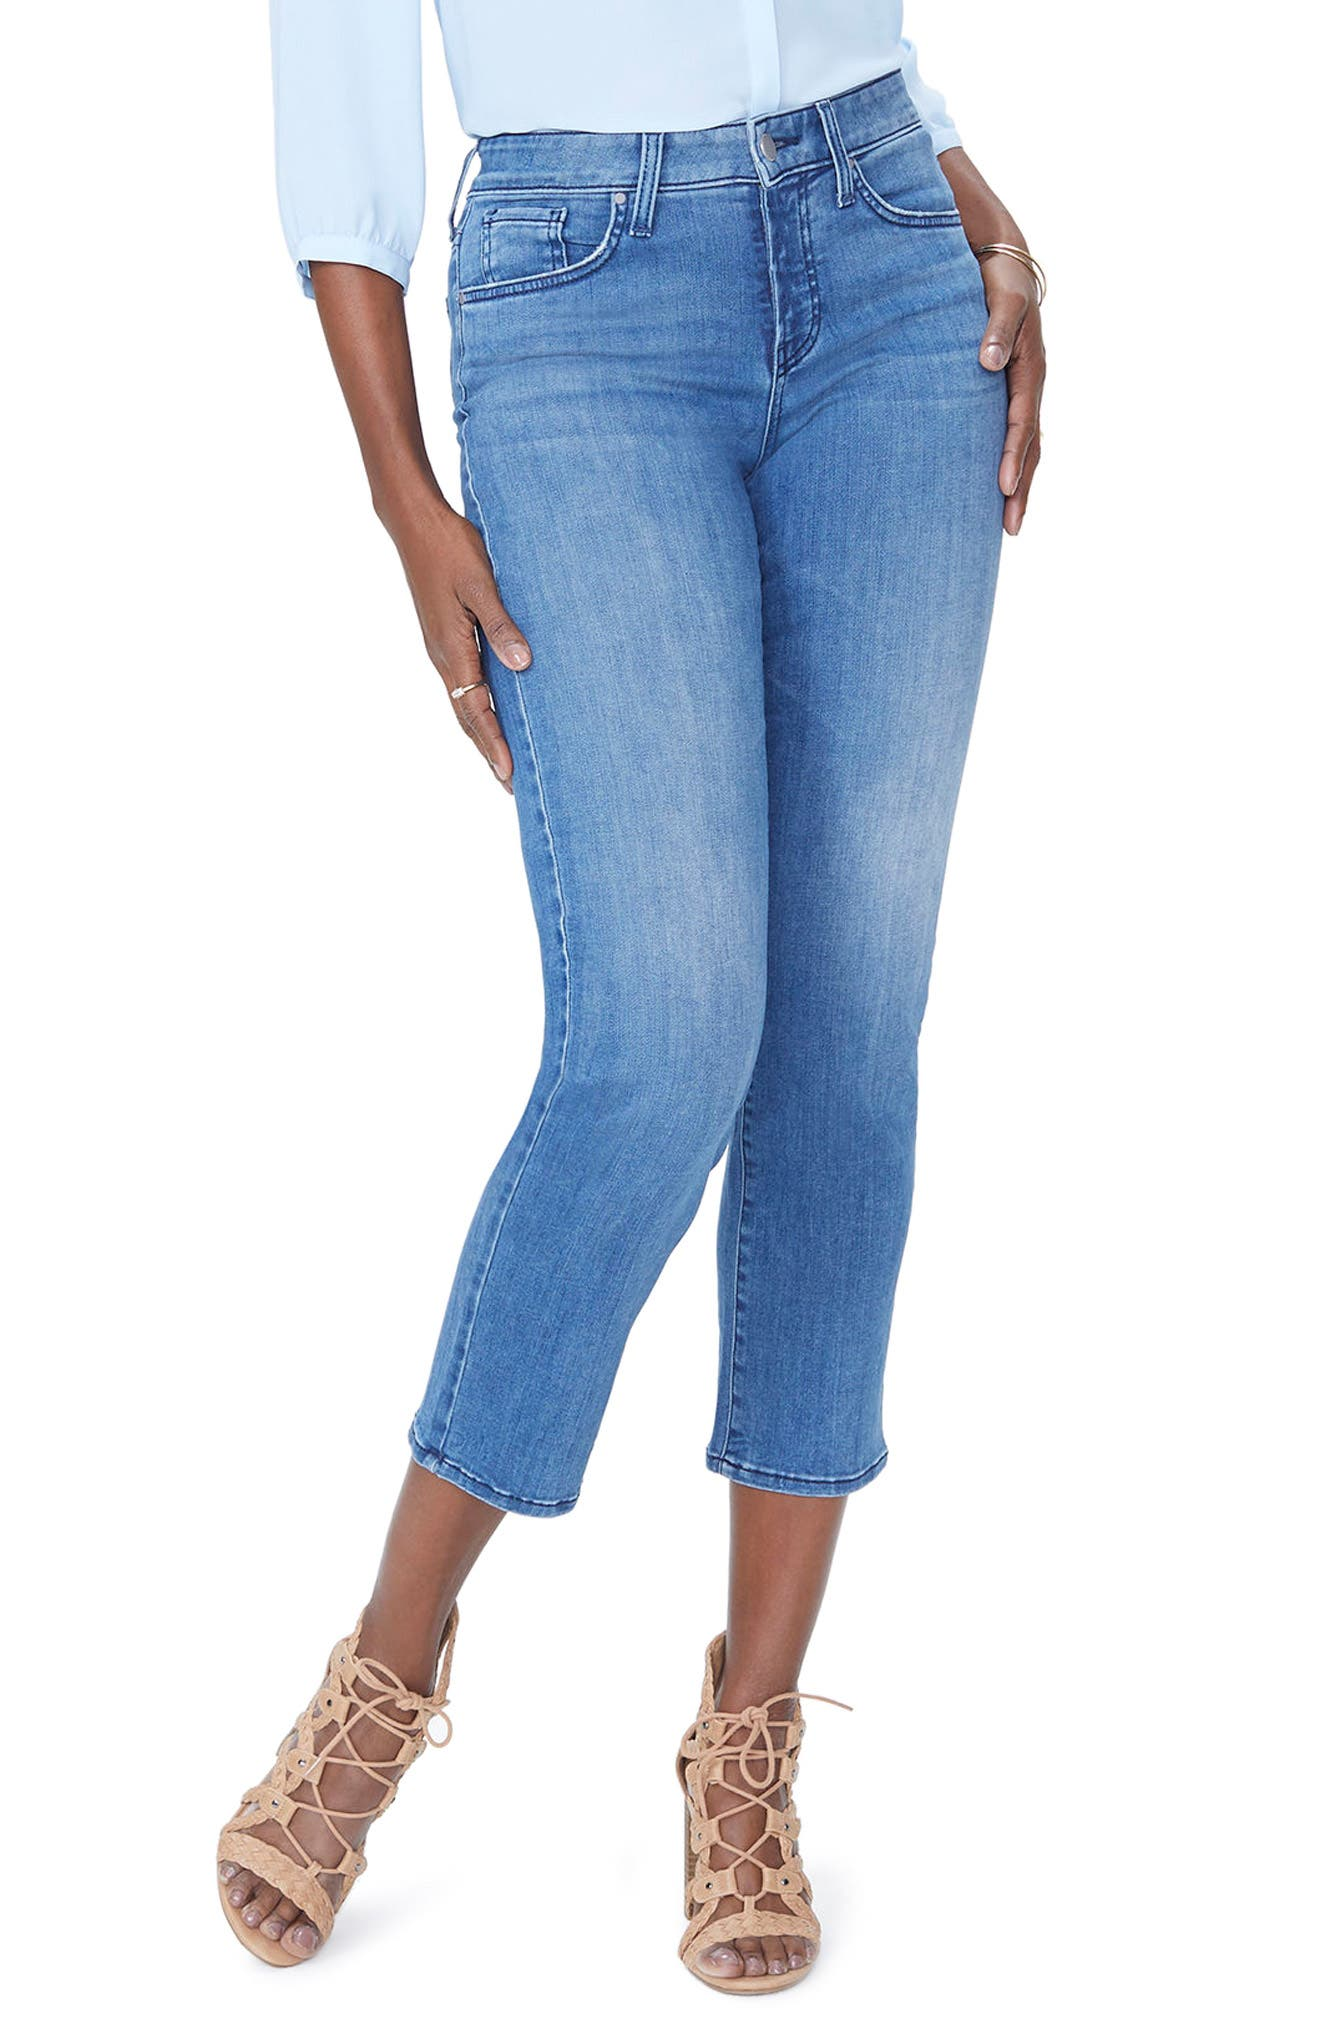 NYDJ Jenna Straight Ankle Crop Jeans